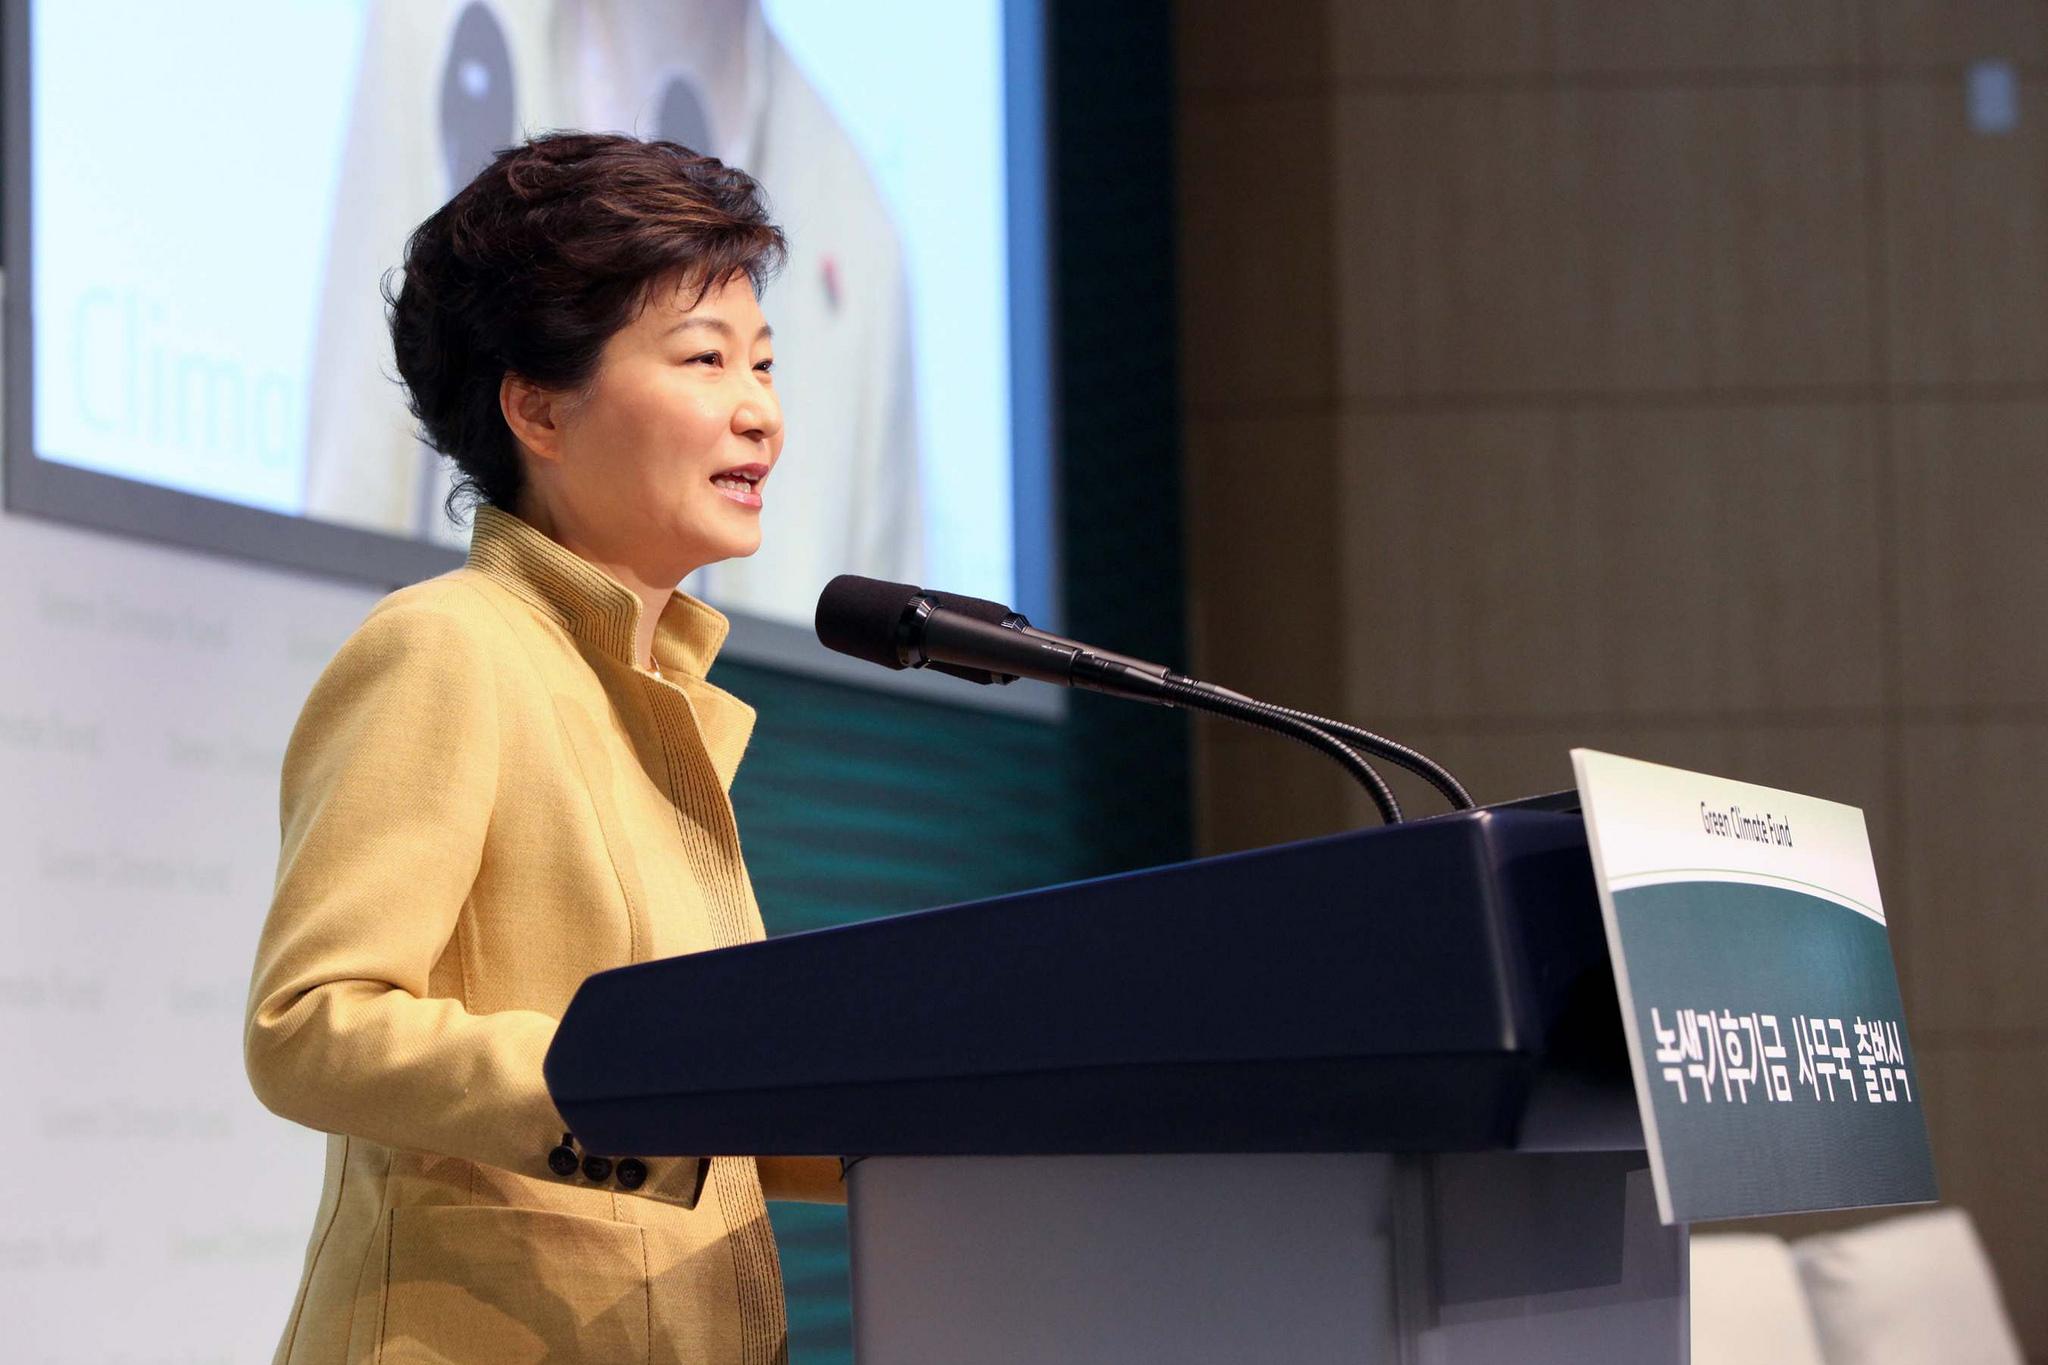 L'héritier de Samsung de nouveau entendu lundi — Corée du Sud